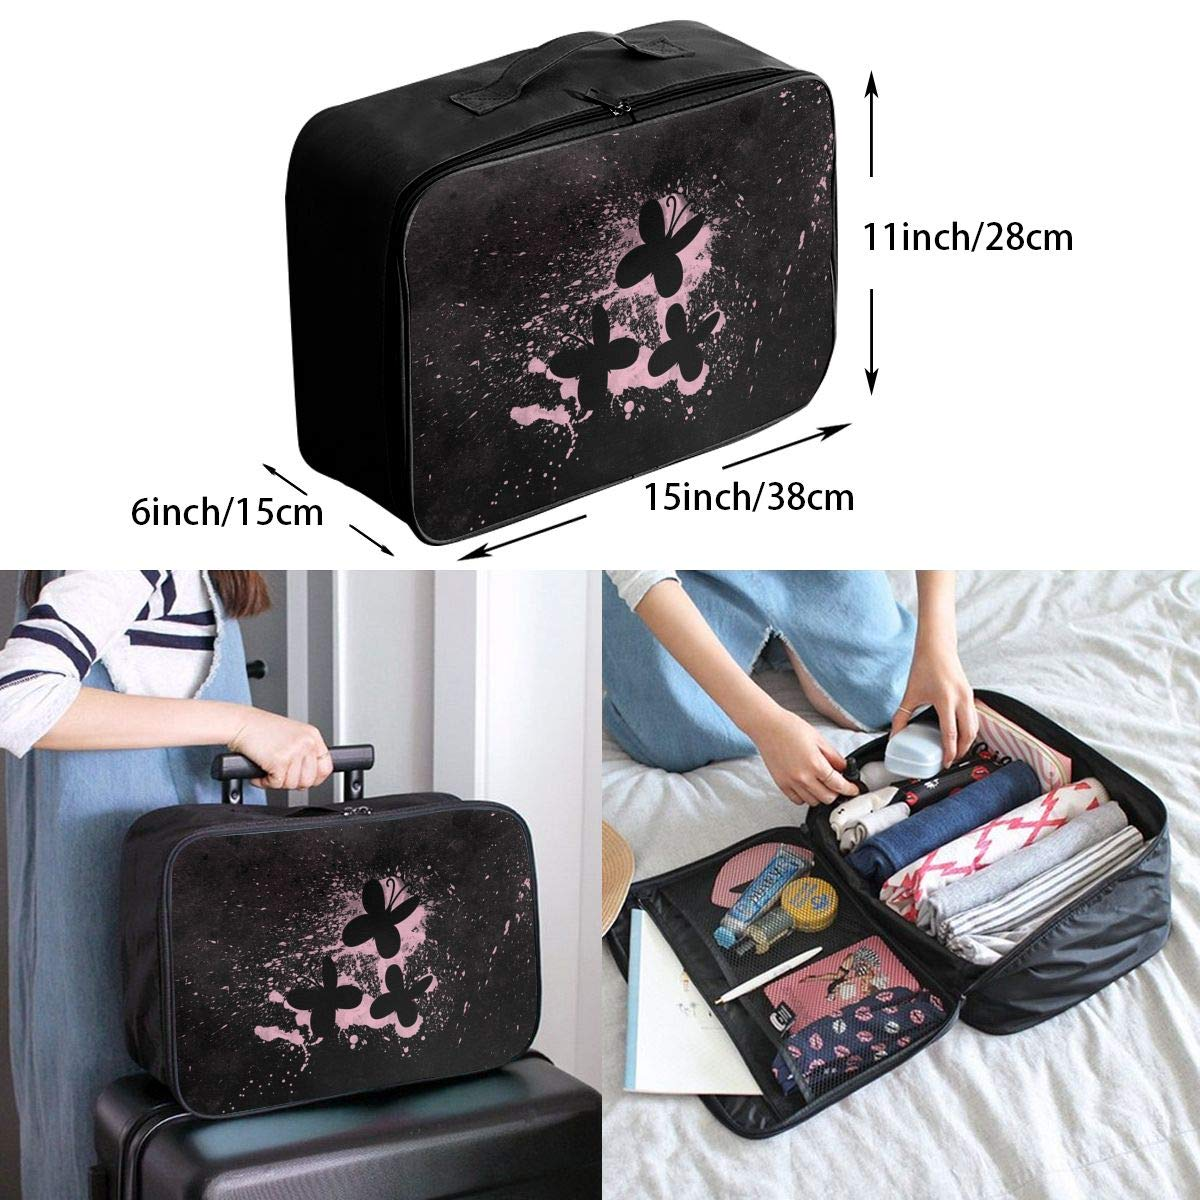 Travel Luggage Duffle Bag Lightweight Portable Handbag Butterflies Print Large Capacity Waterproof Foldable Storage Tote